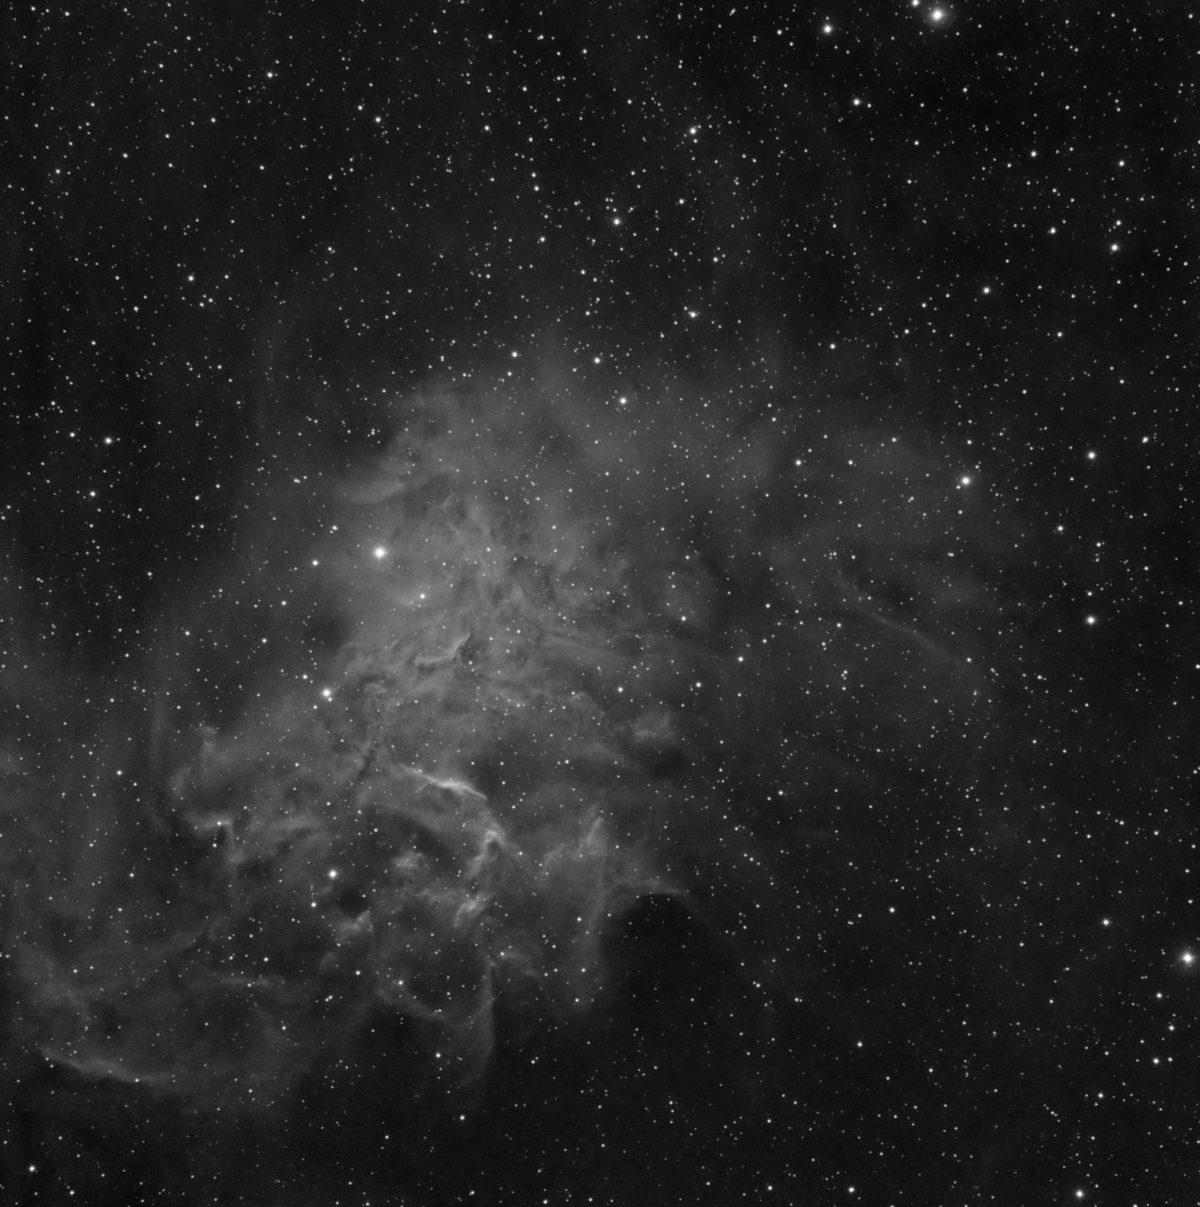 IC 405 flaming star nebula 1200x1207 - IC405 flaming star nebula